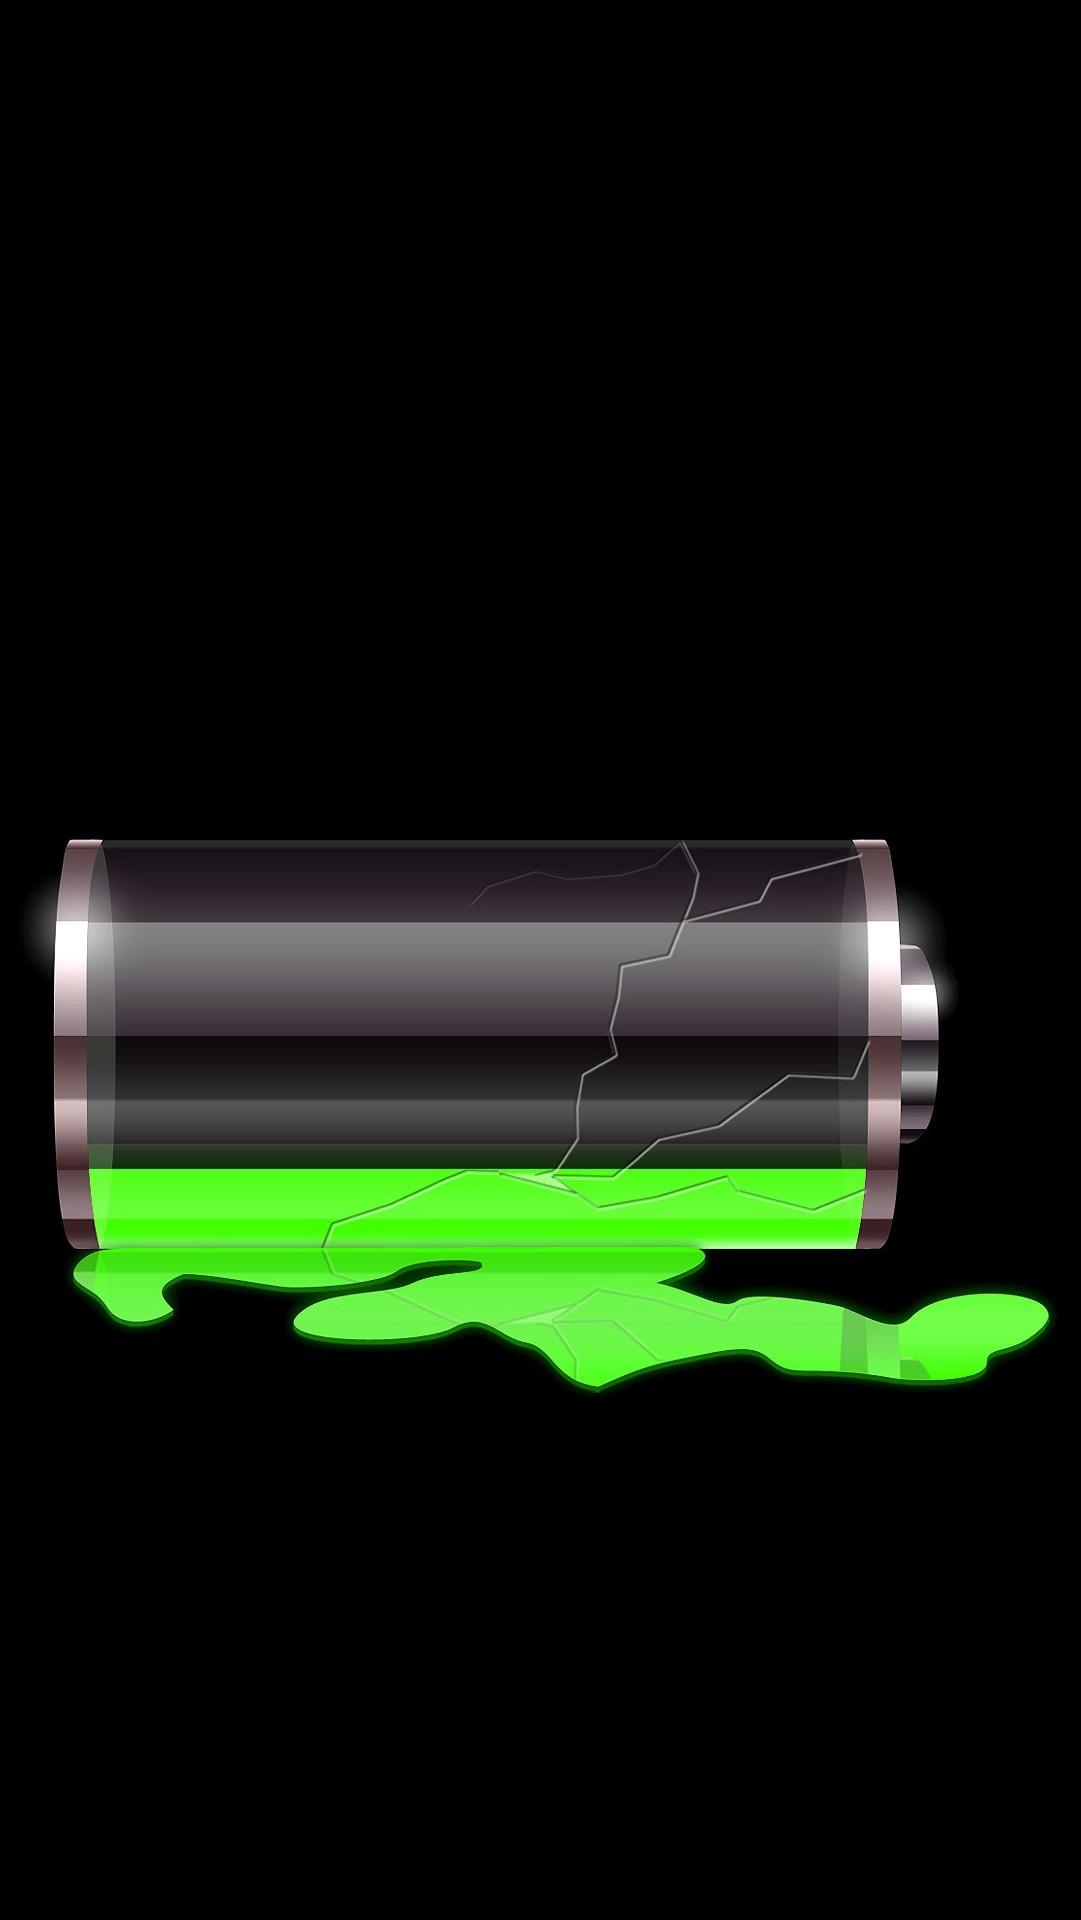 Lockscreens Broken Battery Black Neon Green Simple